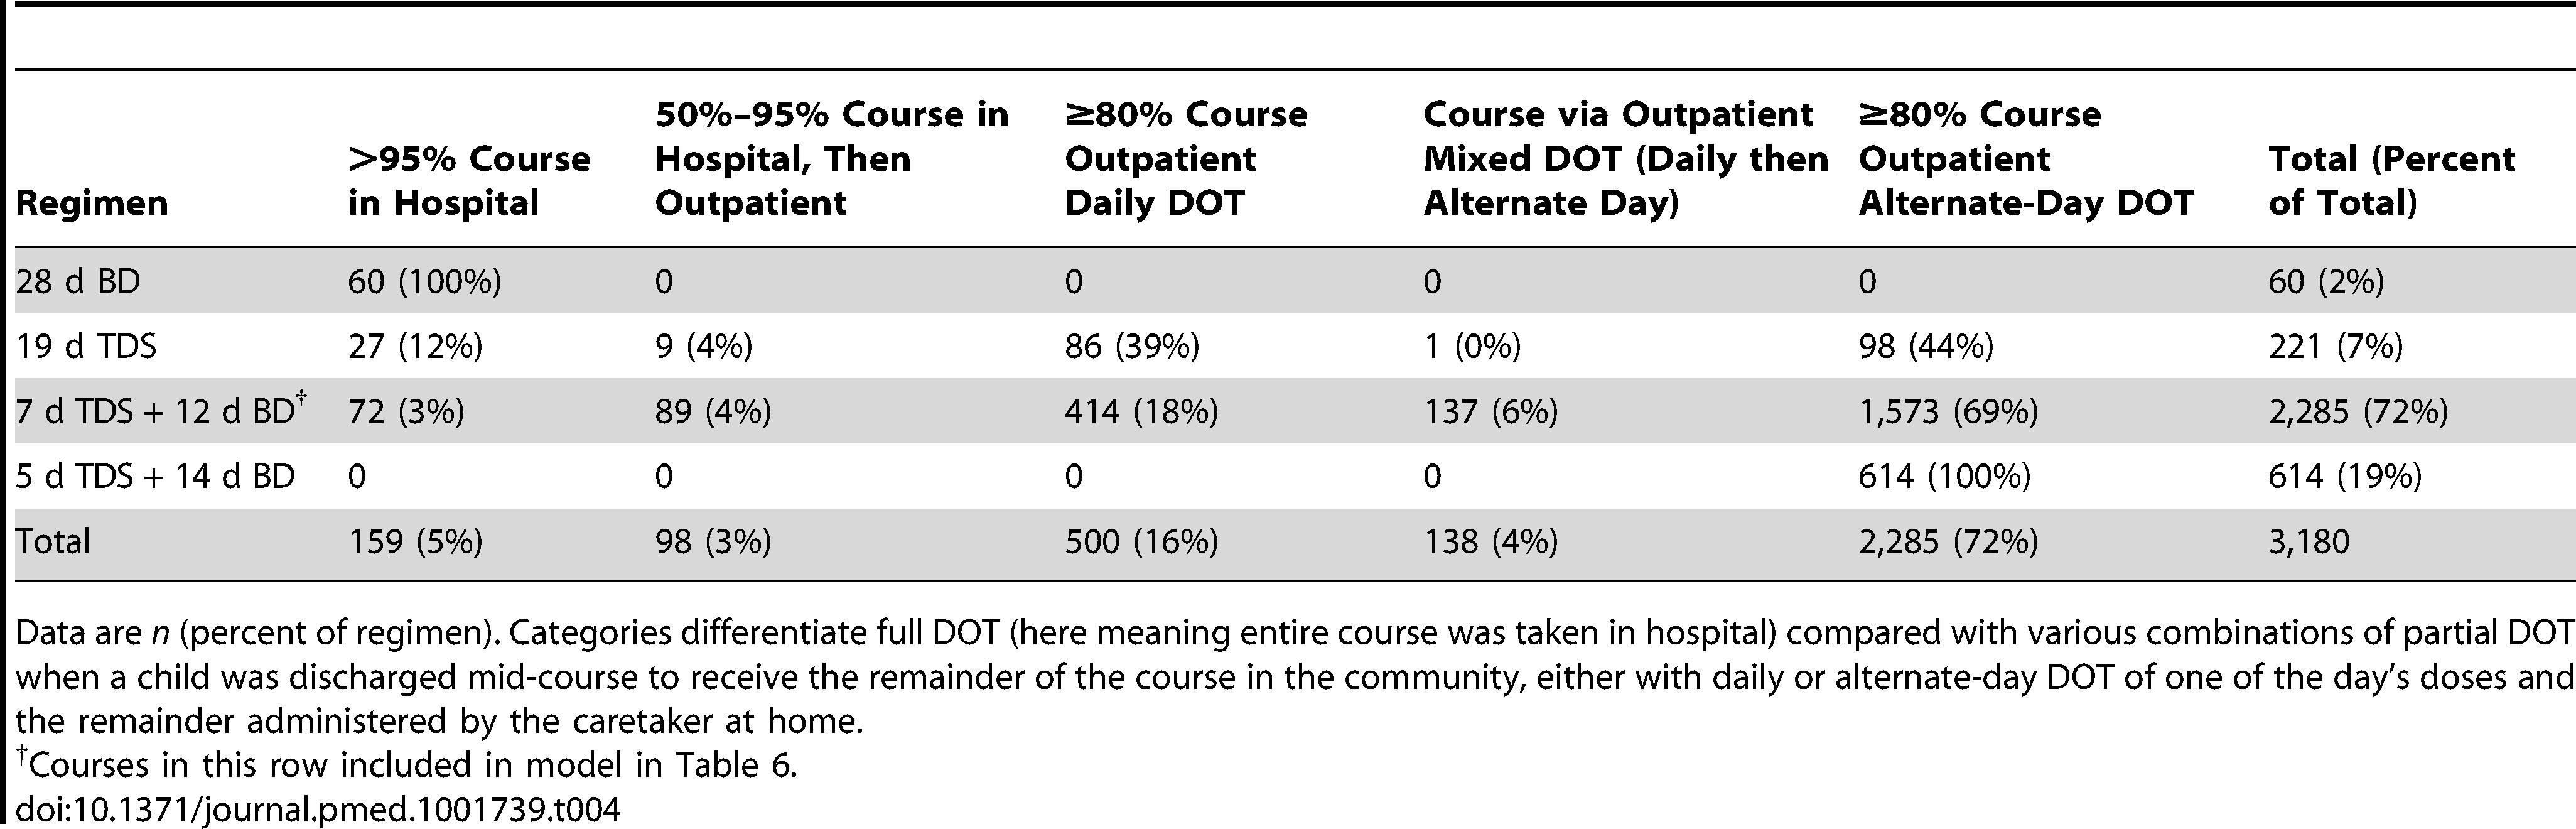 Number of courses by dose regimen and administration regimen.